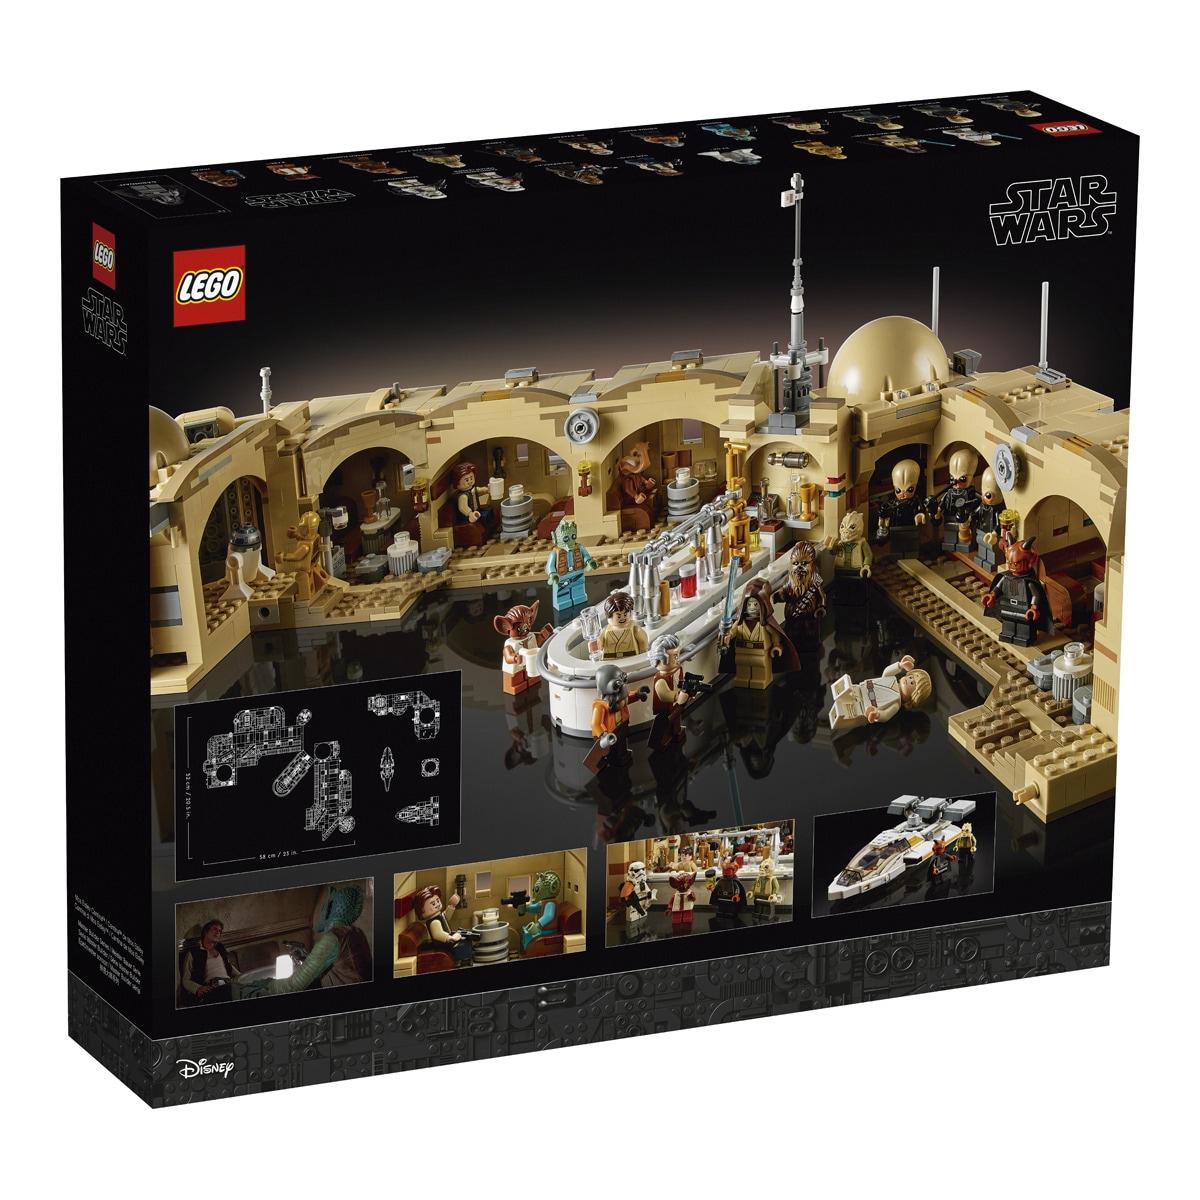 Jouet Lego Star Wars (75290) - La Cantine de Mos Eisley